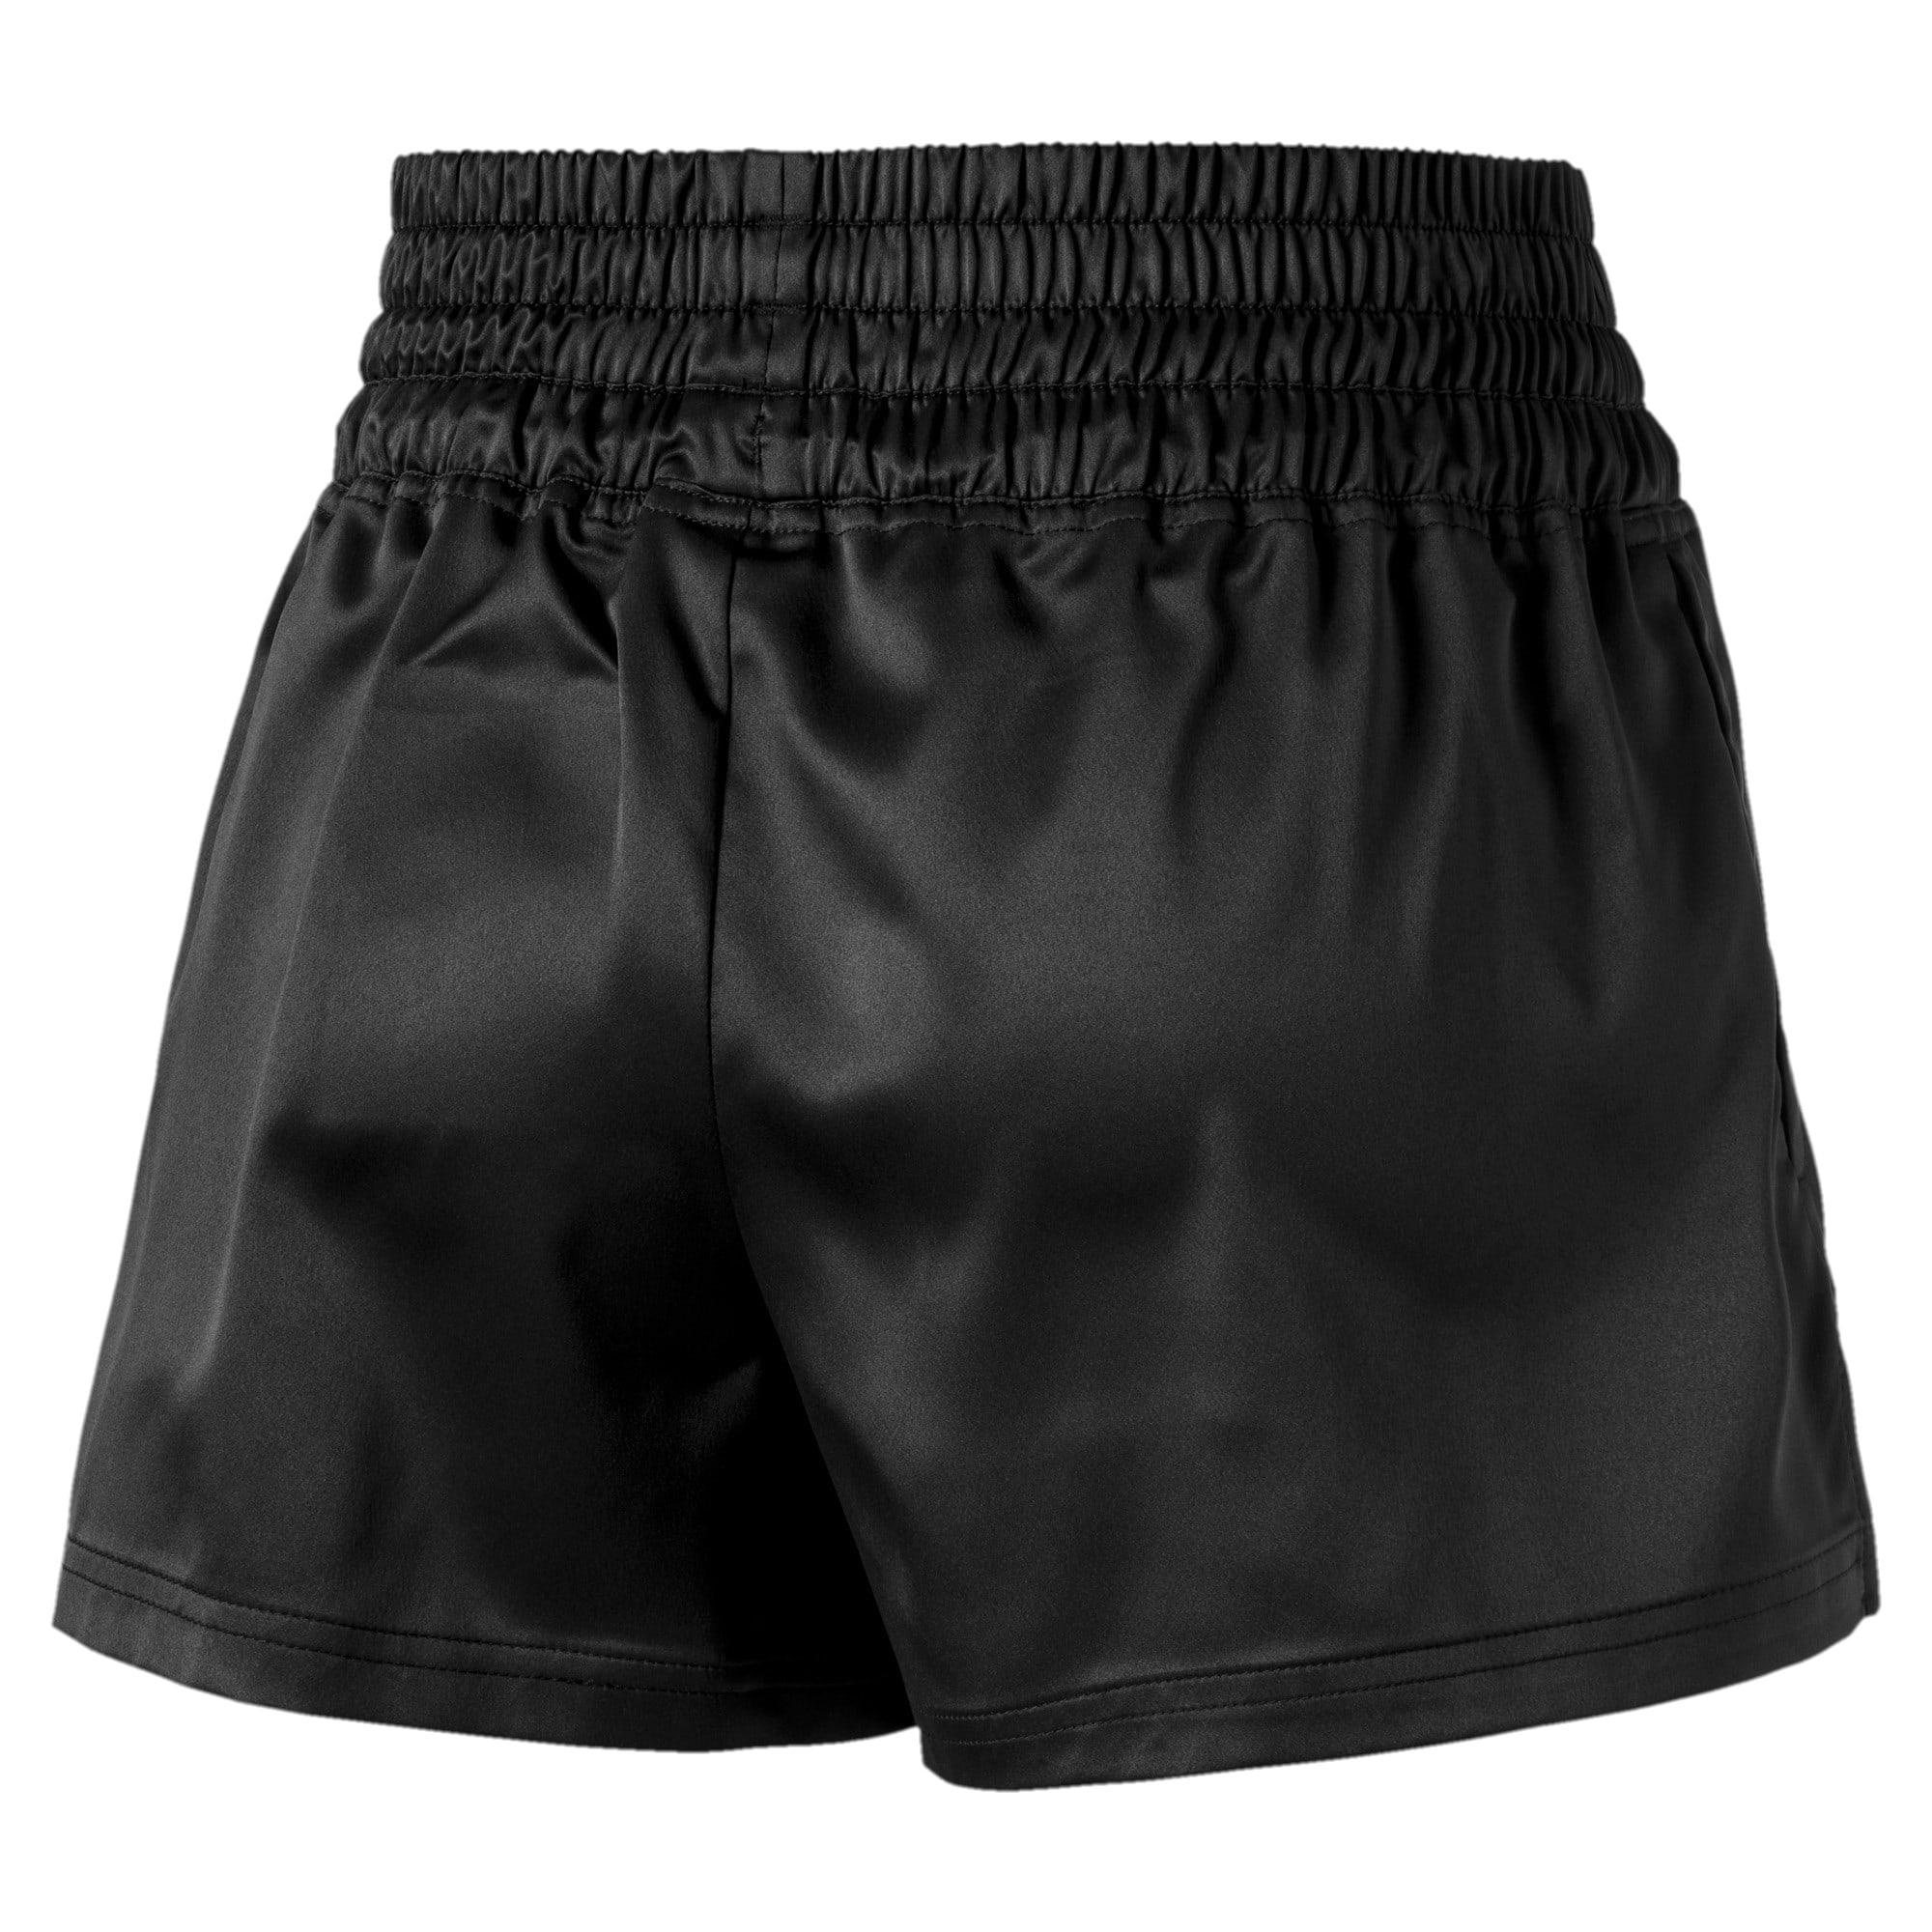 Thumbnail 5 of On the Brink Women's Shorts, Puma Black, medium